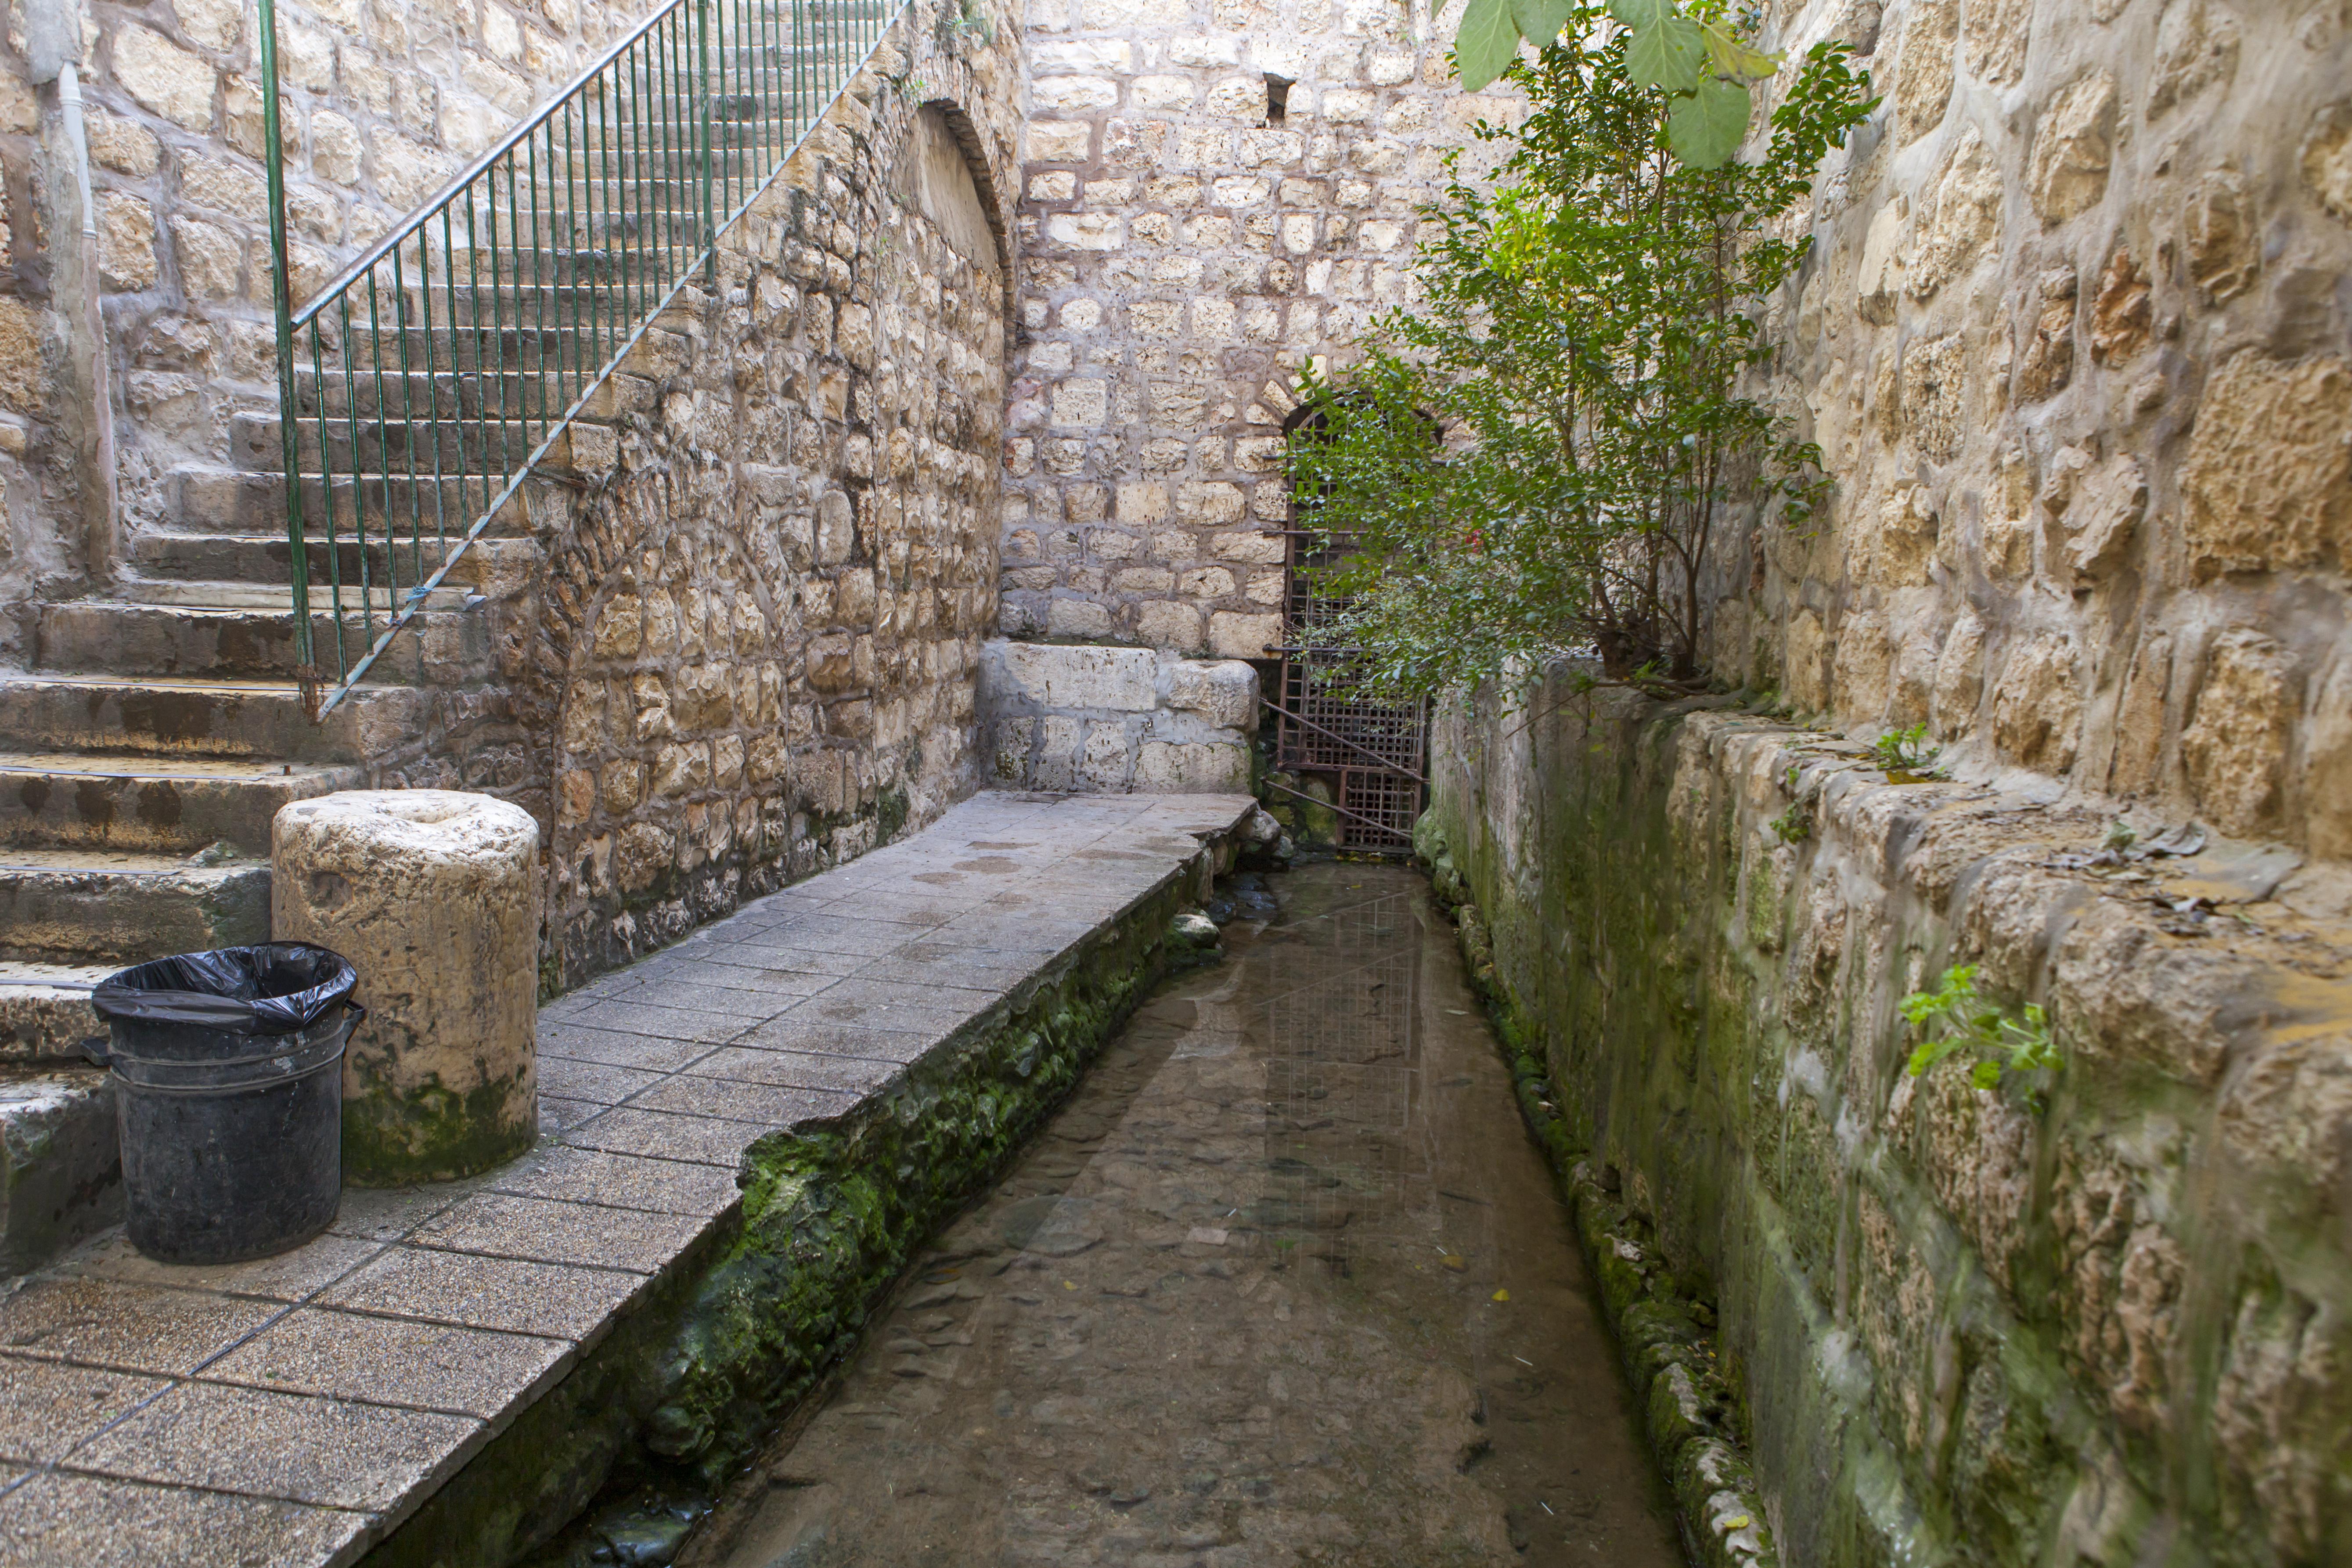 The Pool of Siloam in Jerusalem.